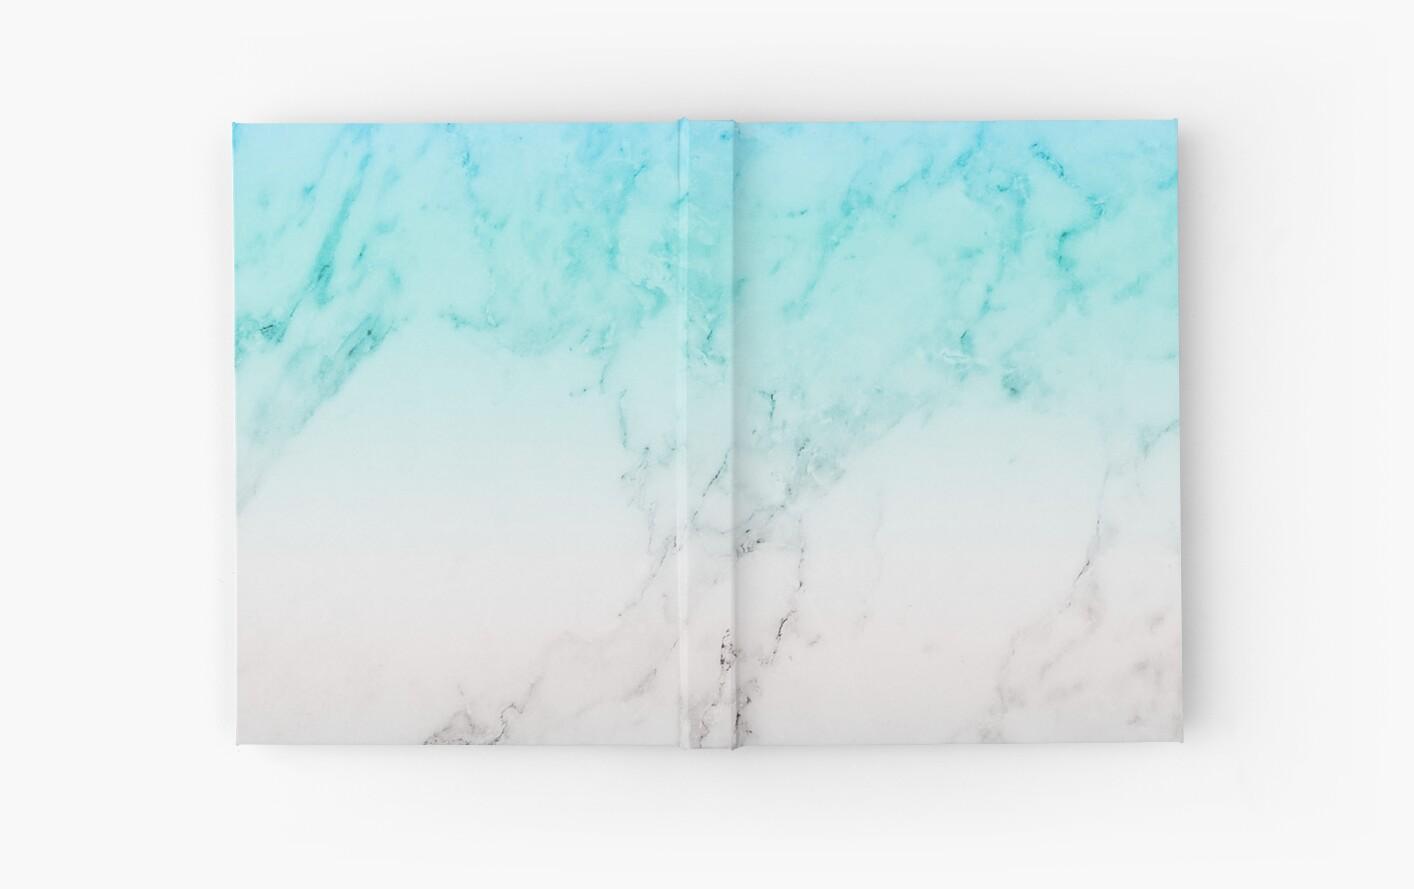 Download Wallpaper Marble Aesthetic - hjo,x1313-bg,f8f8f8  Graphic_632793.jpg